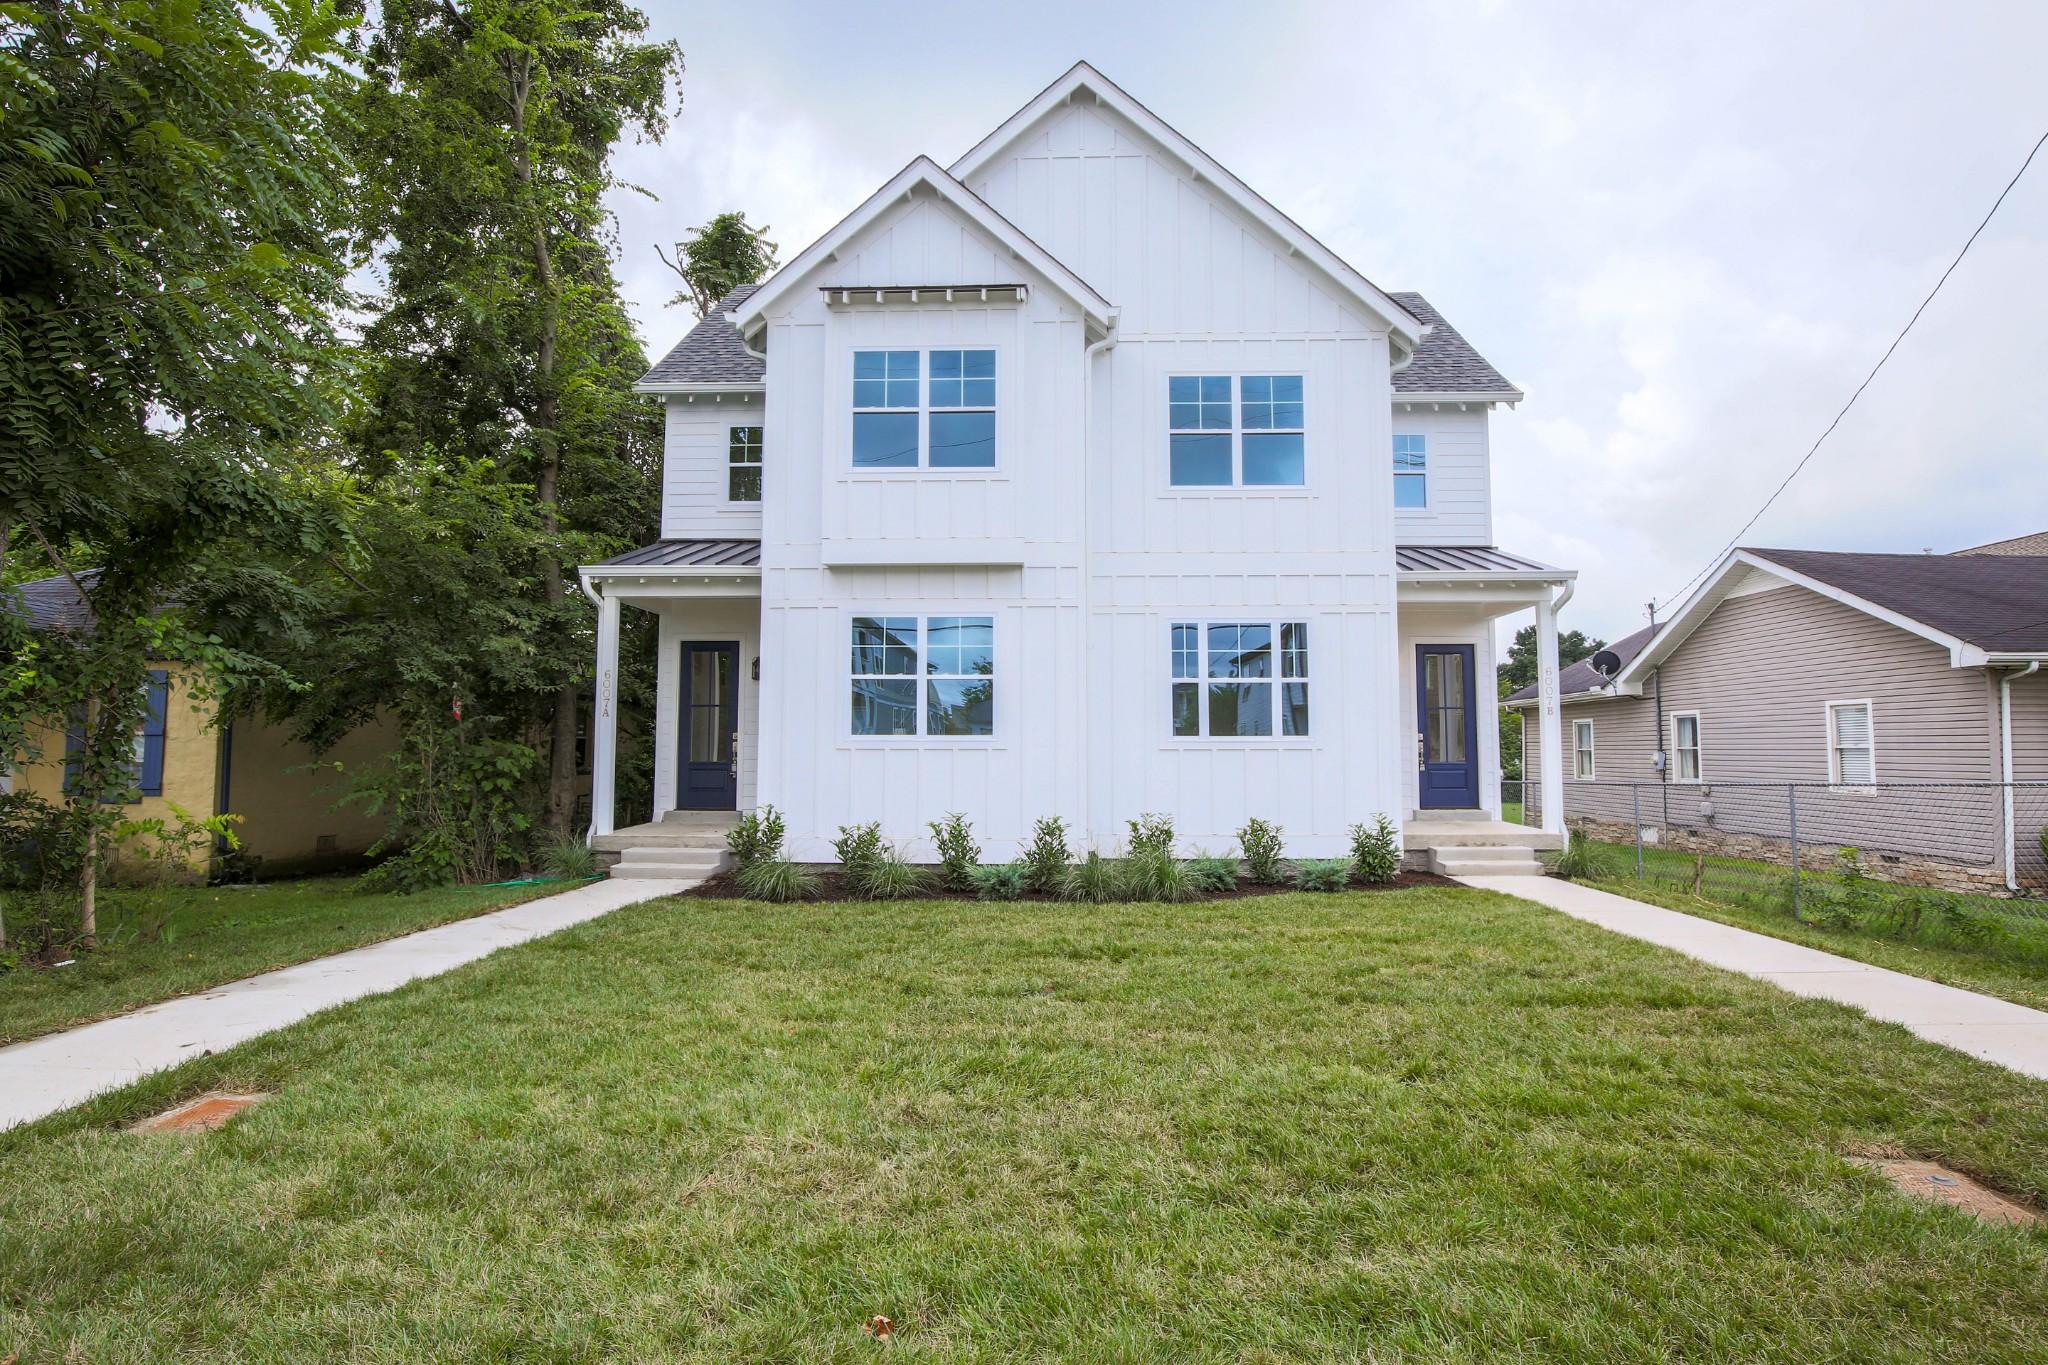 6007B California Ave Property Photo - Nashville, TN real estate listing